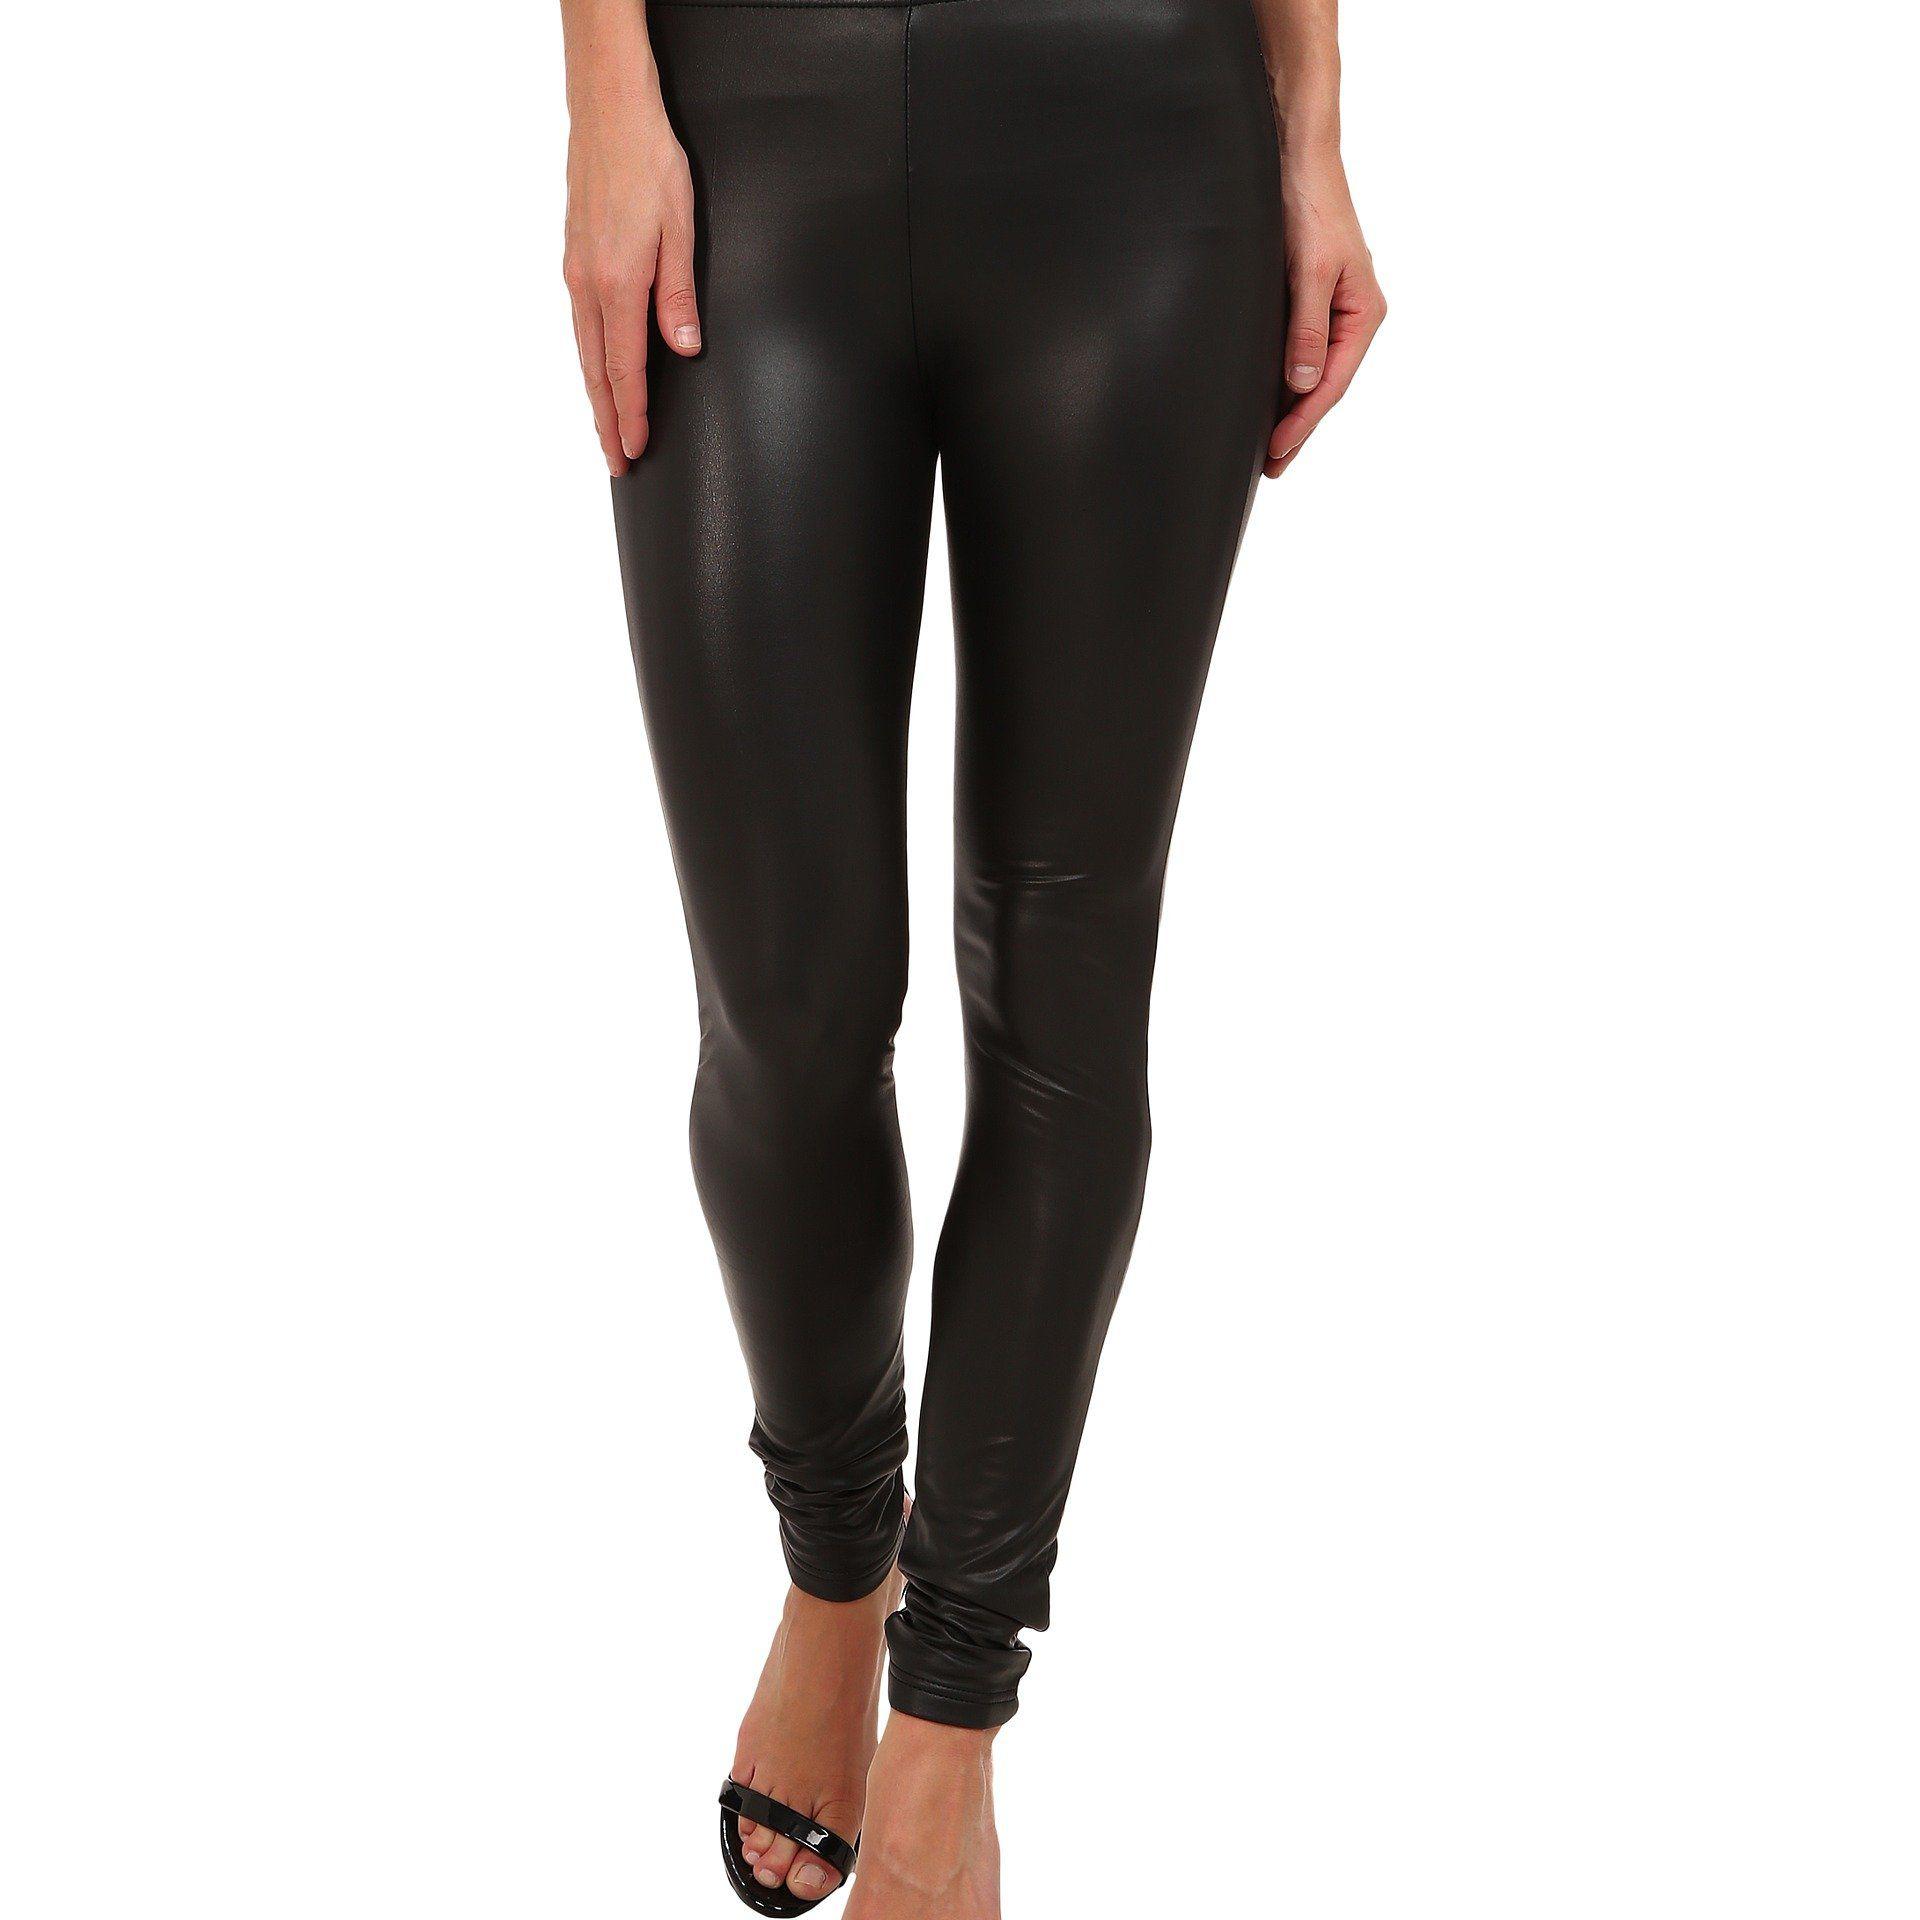 ed01ab7c79bad Best Splurge: Plush Fleece-Lined Liquid Leggings